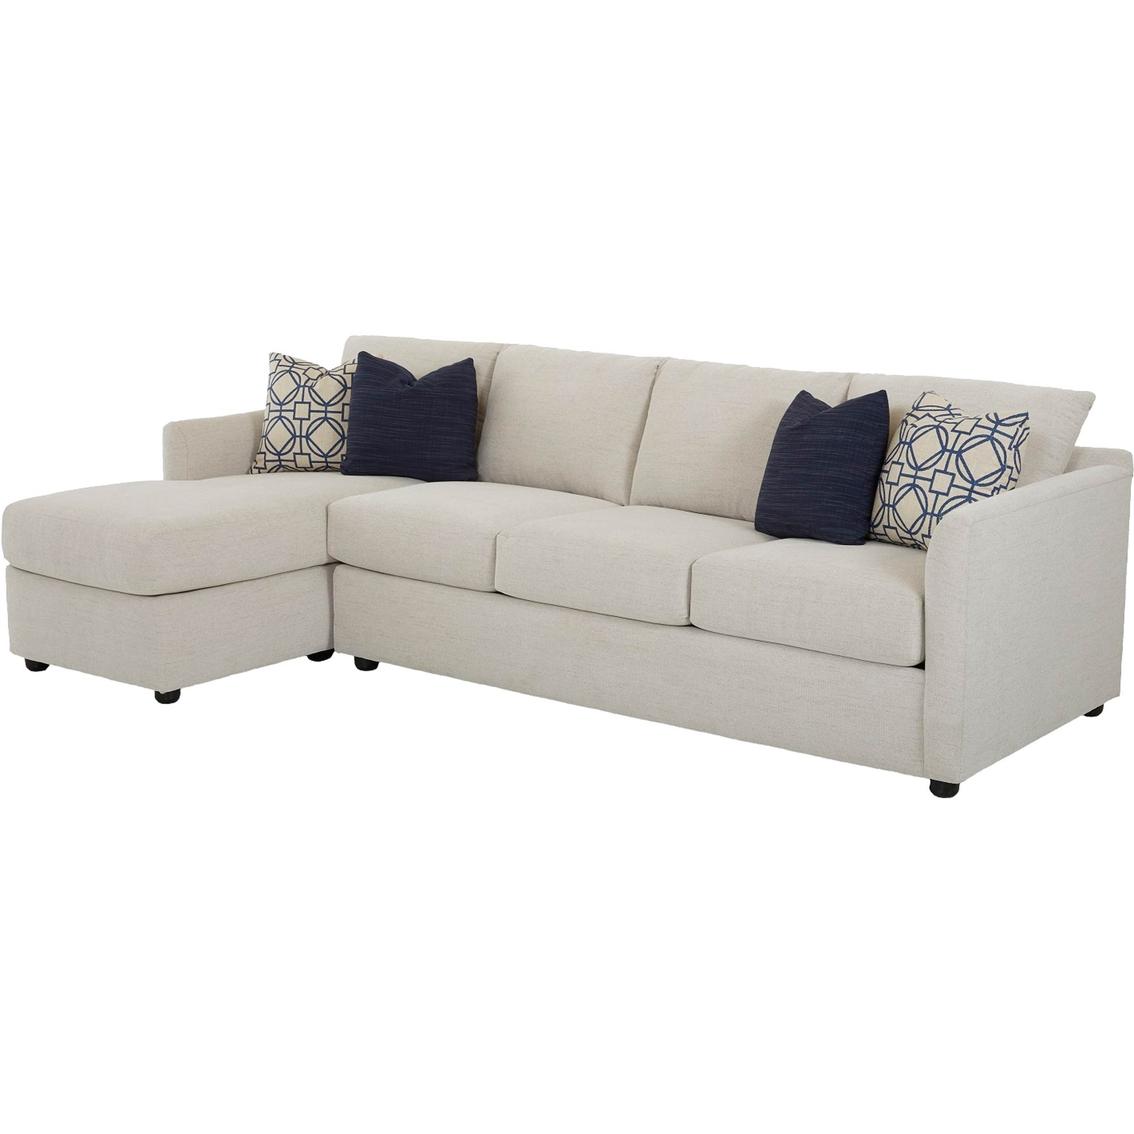 Klaussner Atlanta 2 Pc. Sectional Raf Queen Sleeper Laf Corner Sofa ...